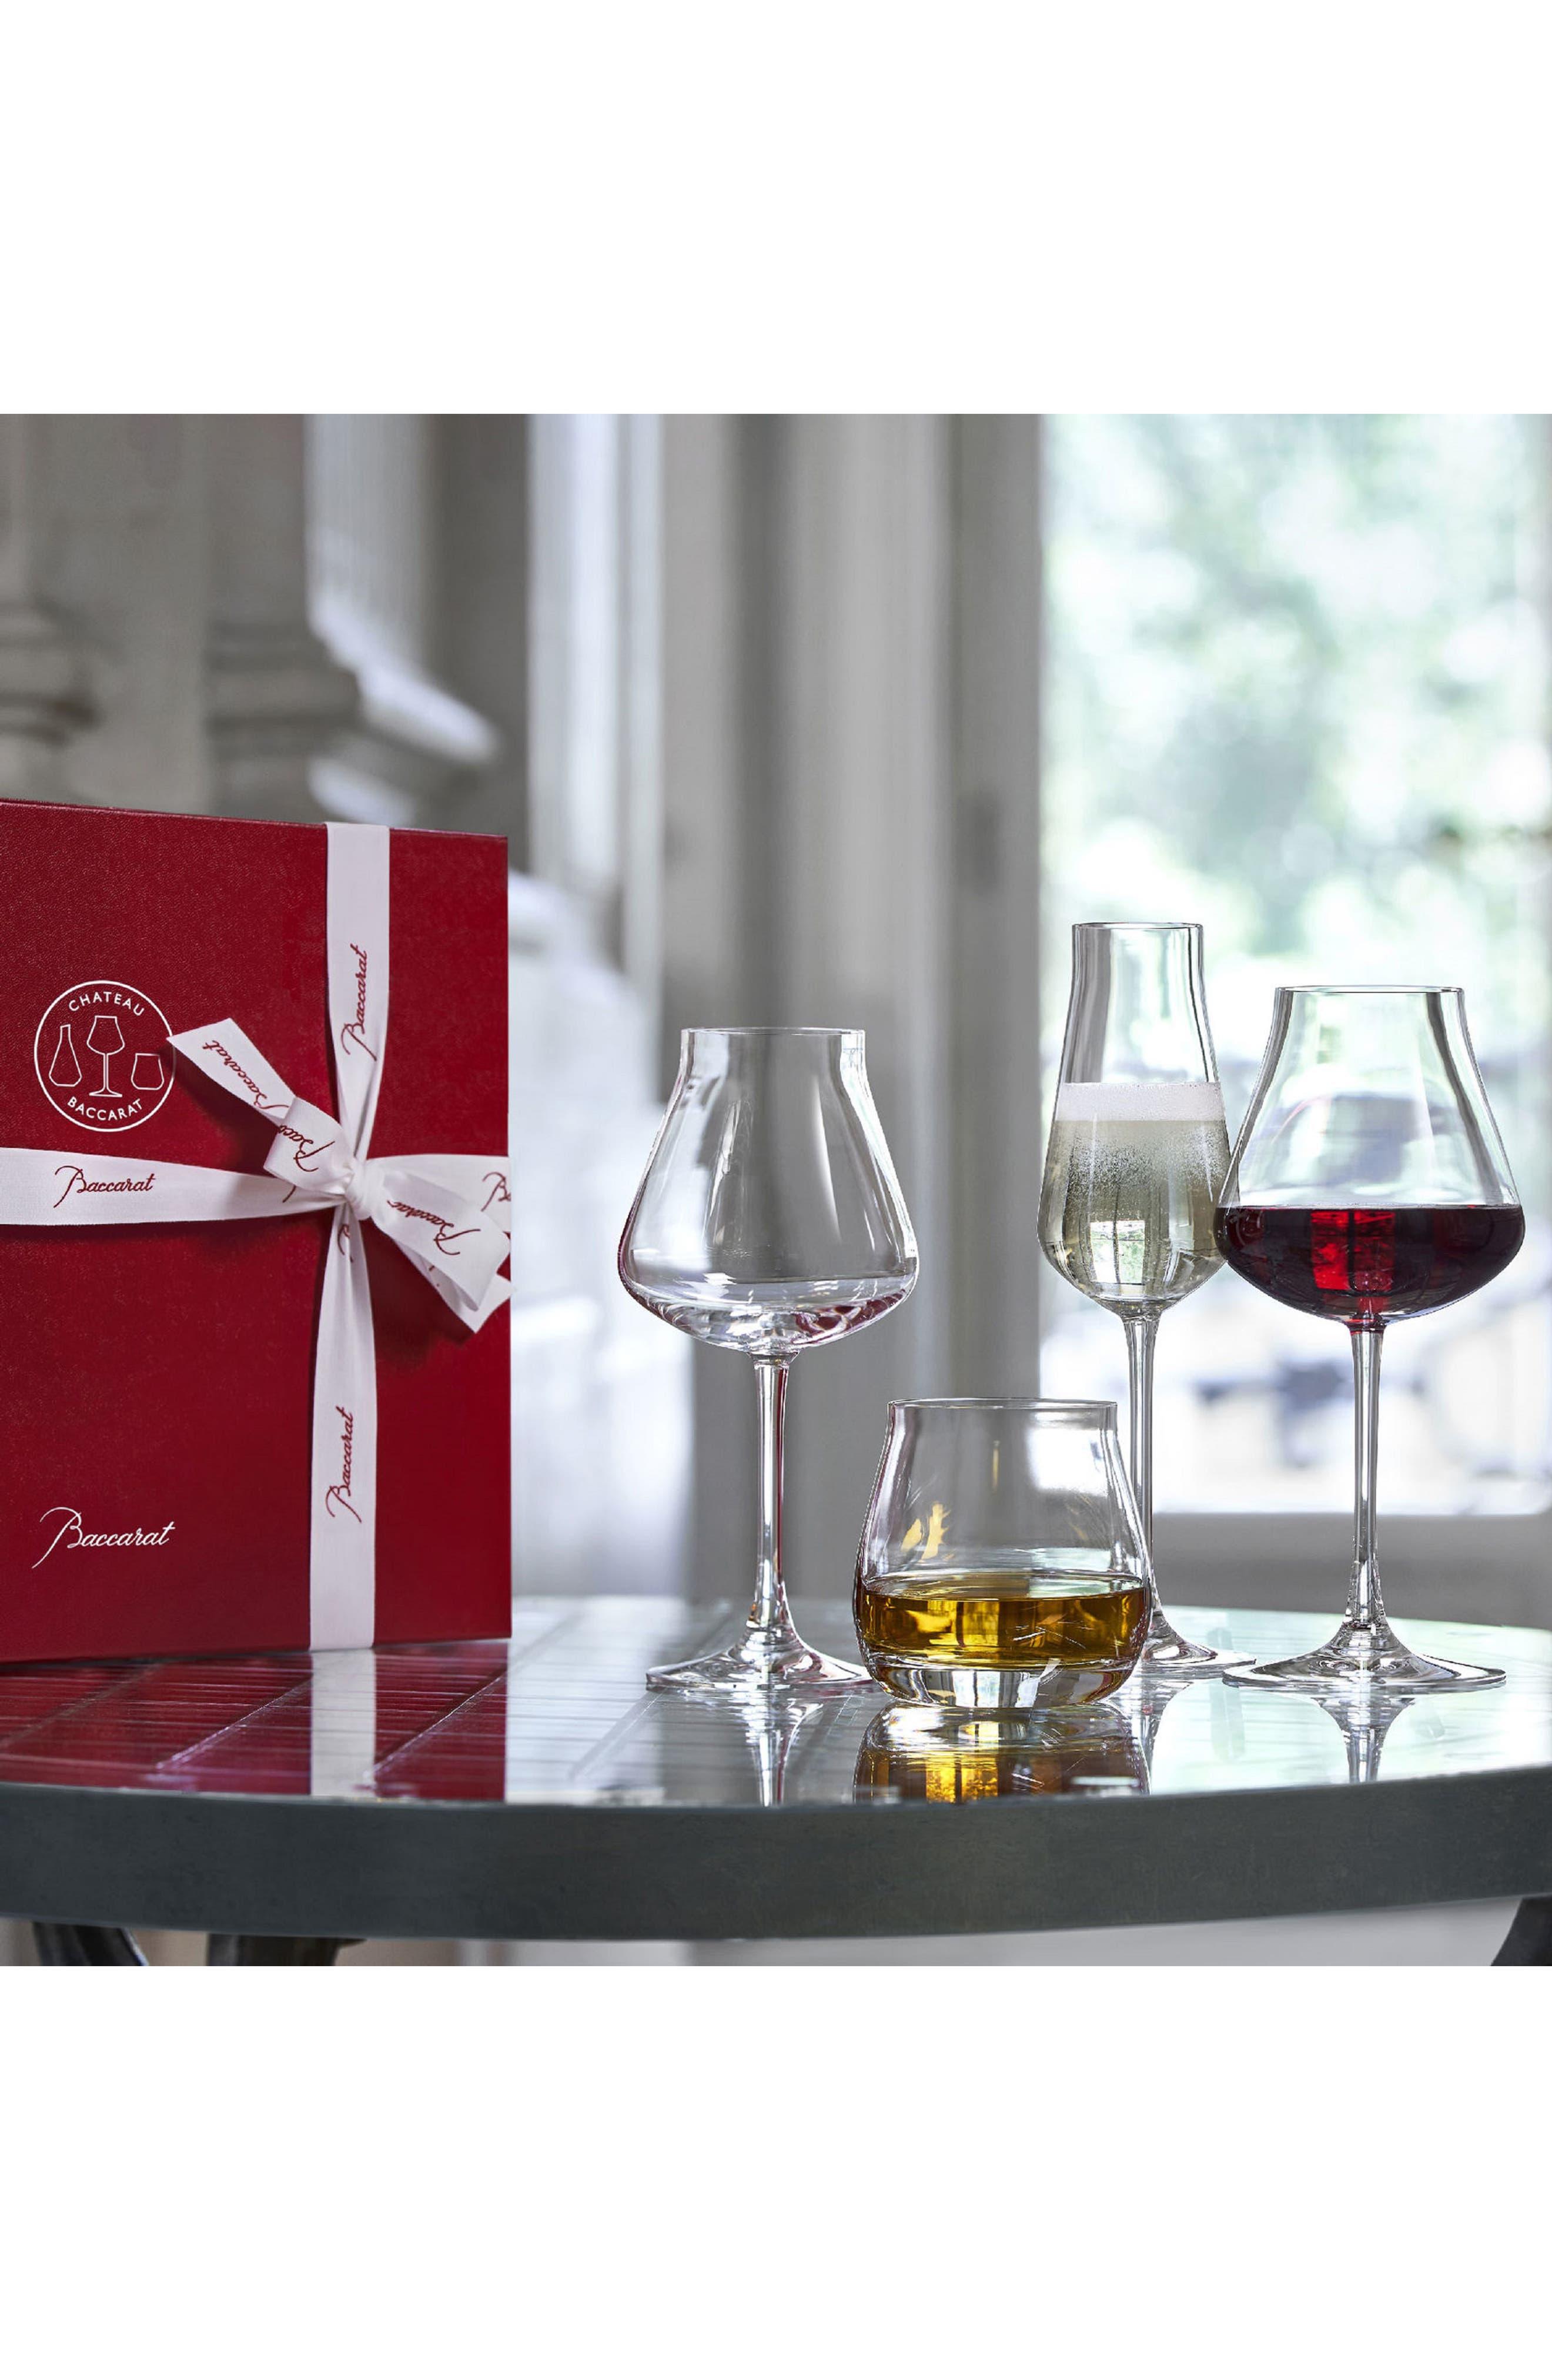 Chateau Baccarat Degustation Set of 4 Lead Crystal Tasting Glasses,                             Alternate thumbnail 2, color,                             CLEAR